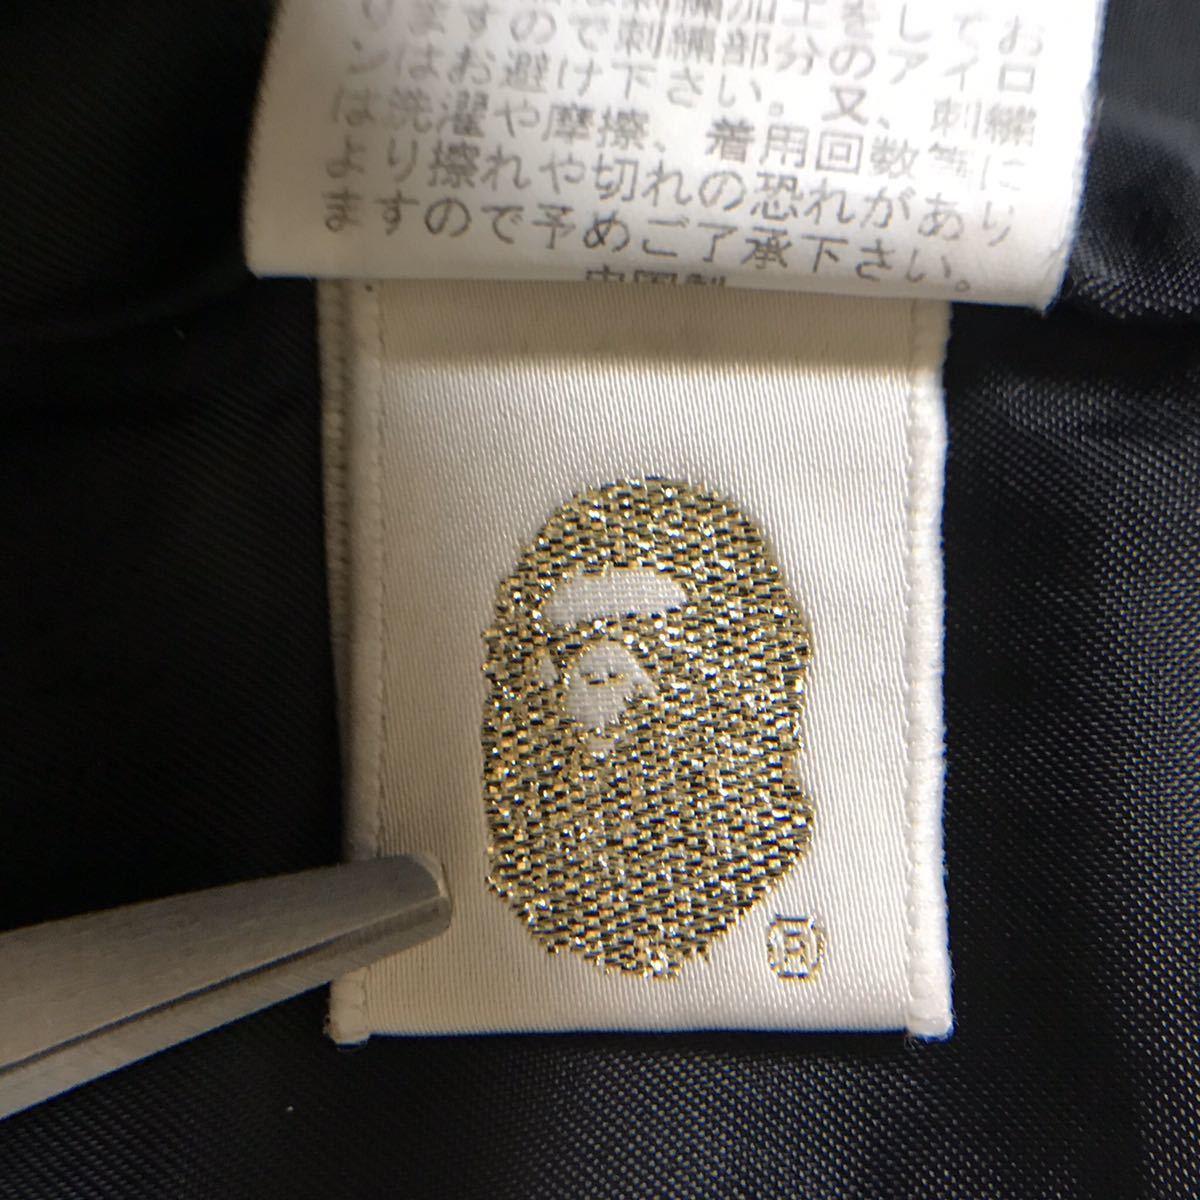 1st camo ナイロン ジャケット Lサイズ a bathing ape BAPE エイプ ベイプ アベイシングエイプ ブルゾン 迷彩 jacket